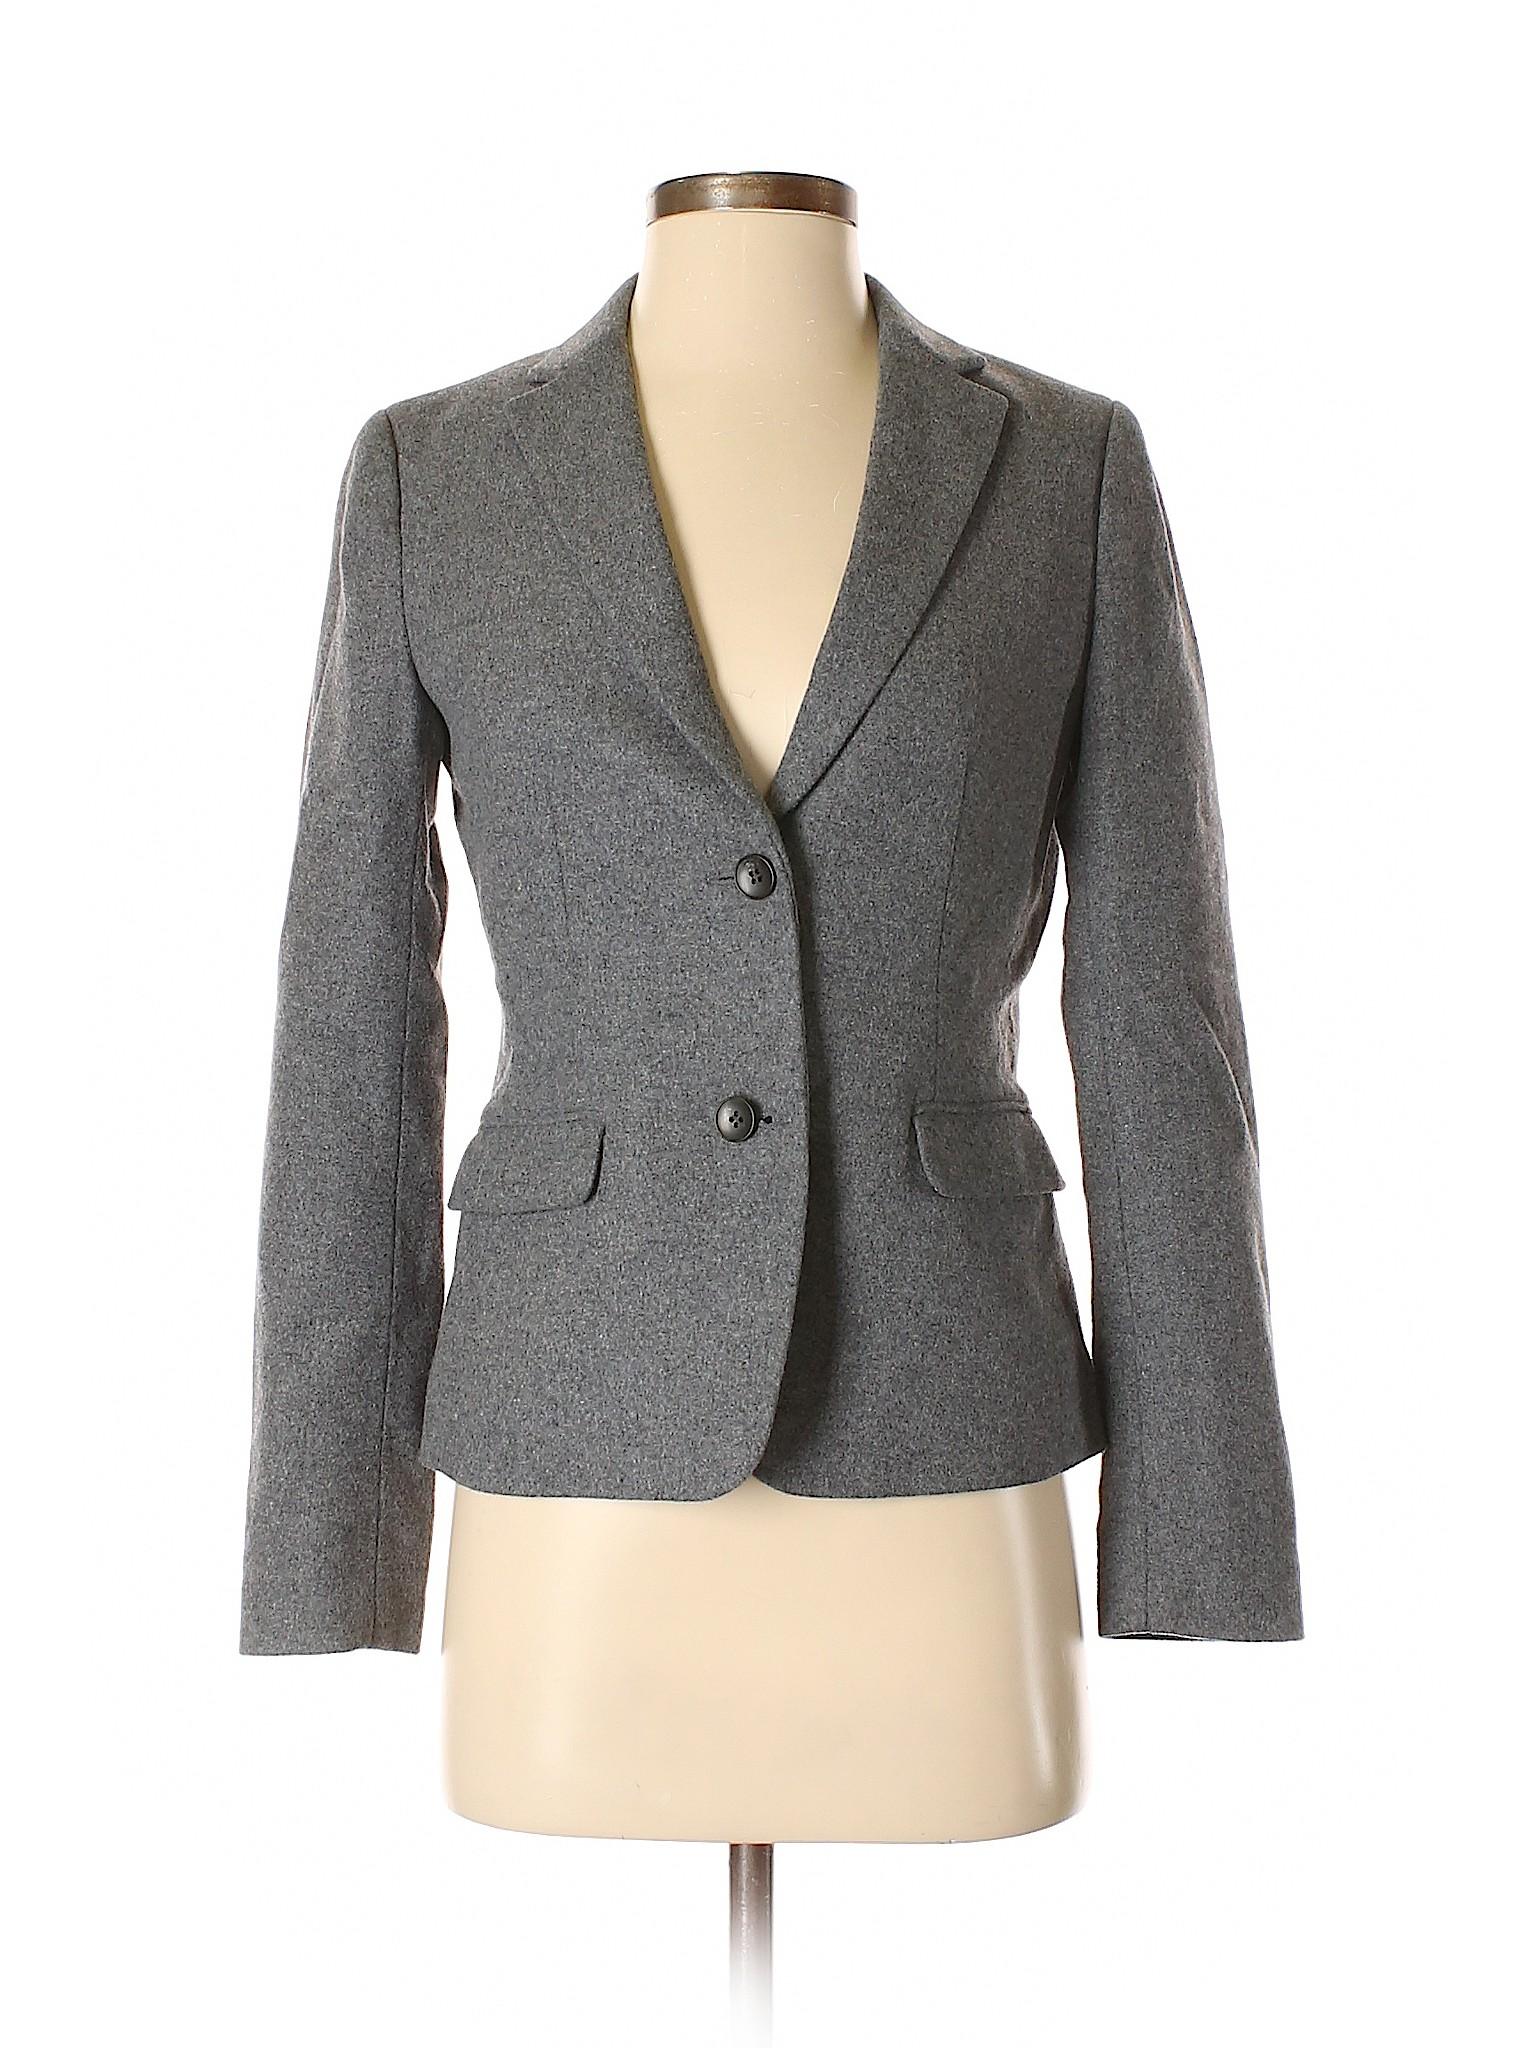 leisure Wool Boutique leisure Uniqlo Boutique Uniqlo Blazer ayCtvqz